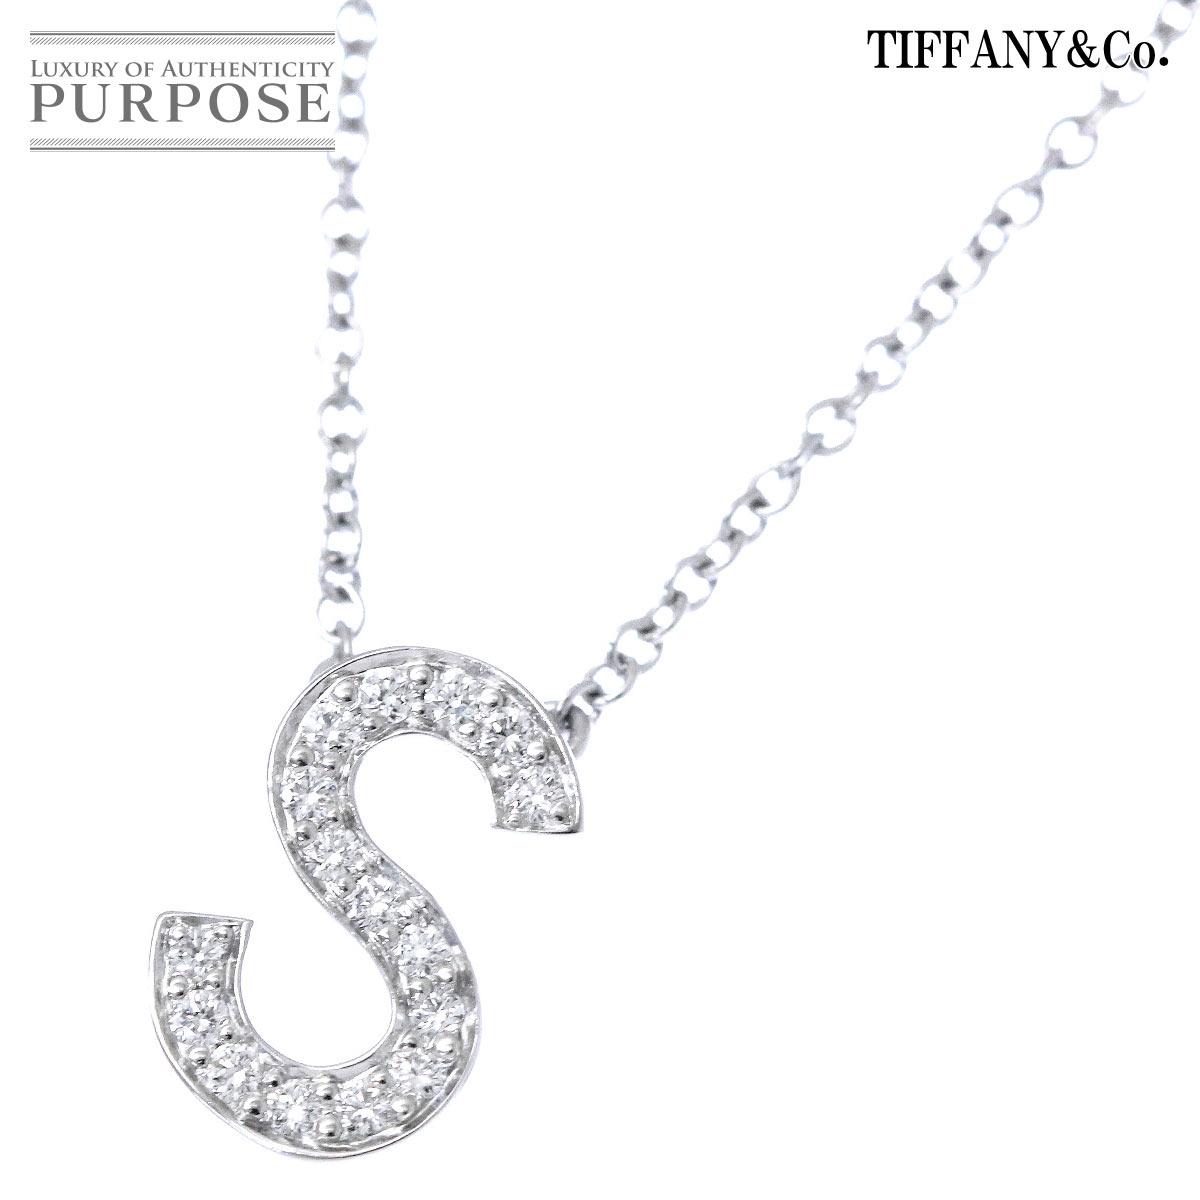 Necklace Length Diagram Tiffany Diamond Initial S Necklace Pt950 41cm Platinum Diagram Tiffanyco